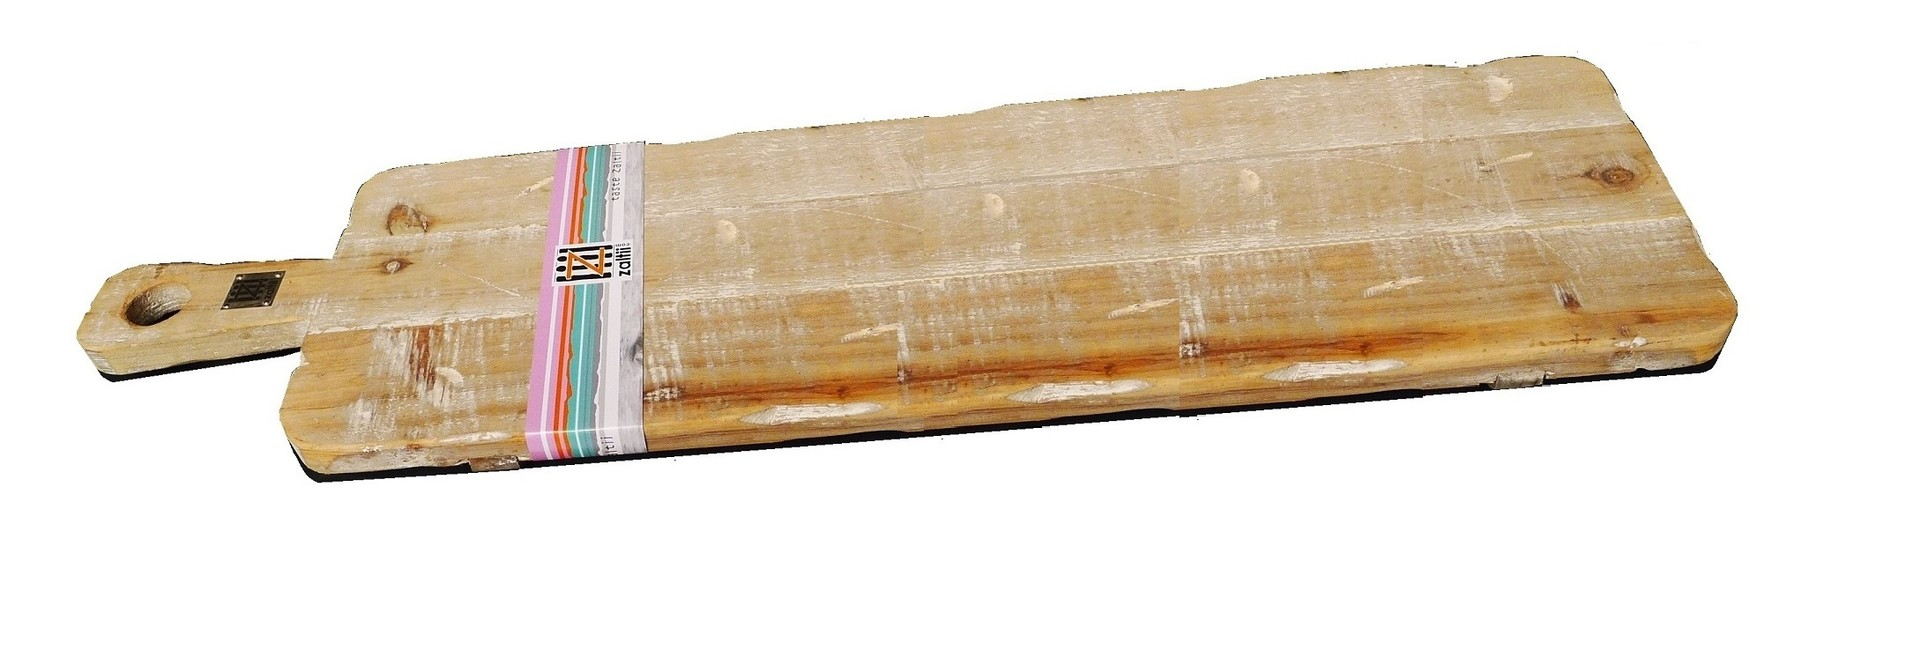 trayold dutchcutting blade 66/20